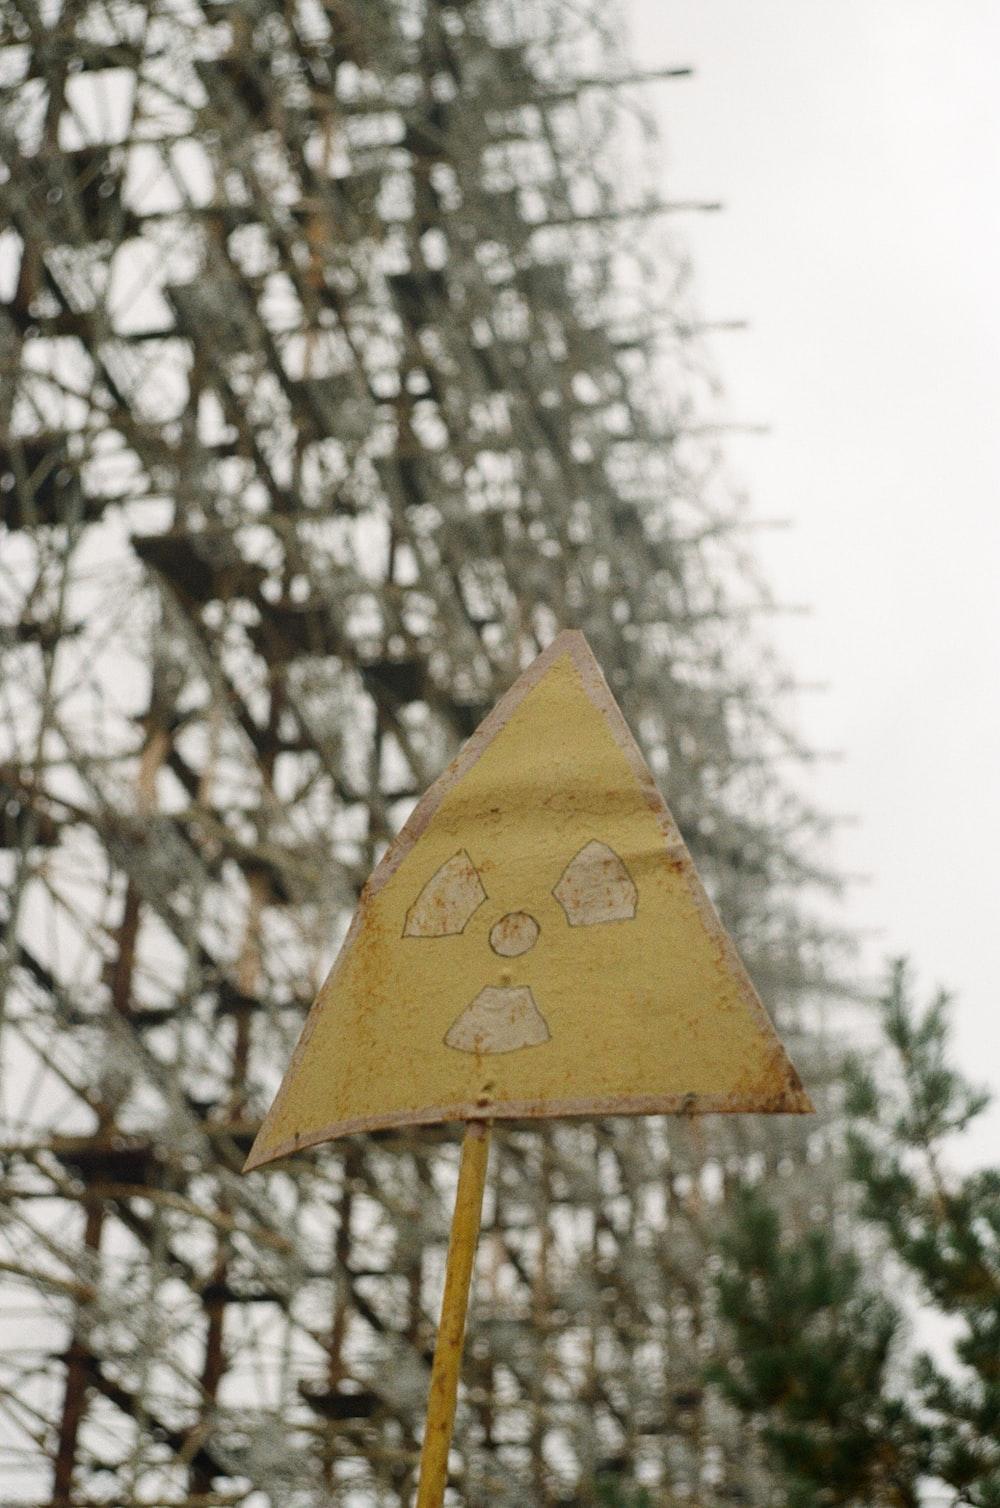 yellow umbrella near bare trees during daytime